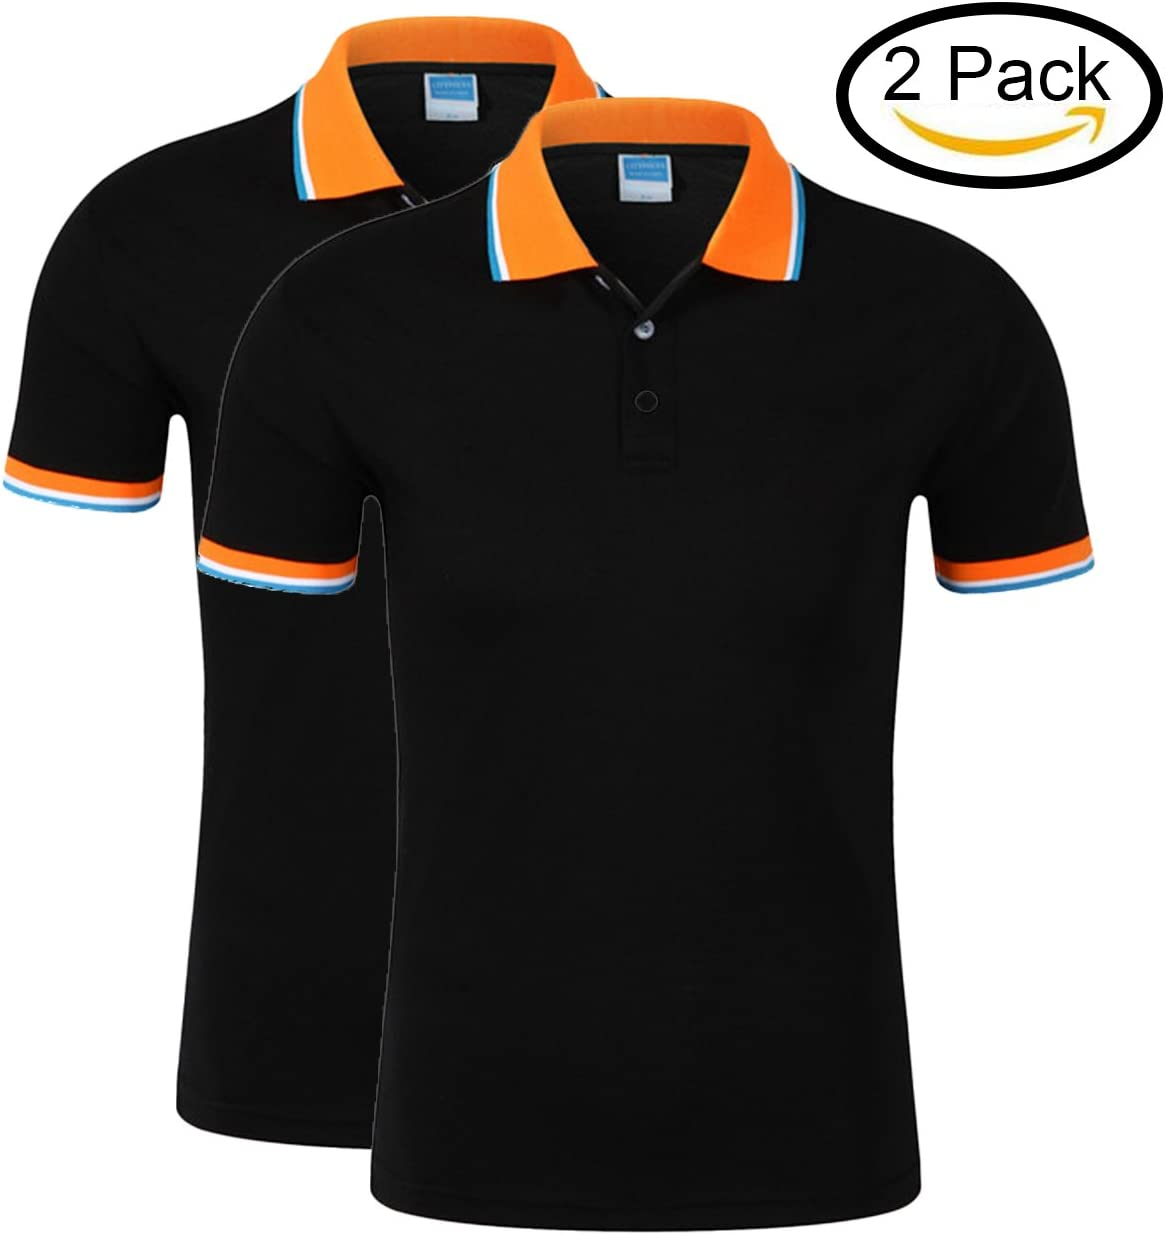 MTTROLI Polo camisetas para mujer, Ladies Polo camisas manga corta Slim fit algodón ropa deportiva Tops 2 unidades, mujer, color Black (Pack of 2), tamaño L/38.58